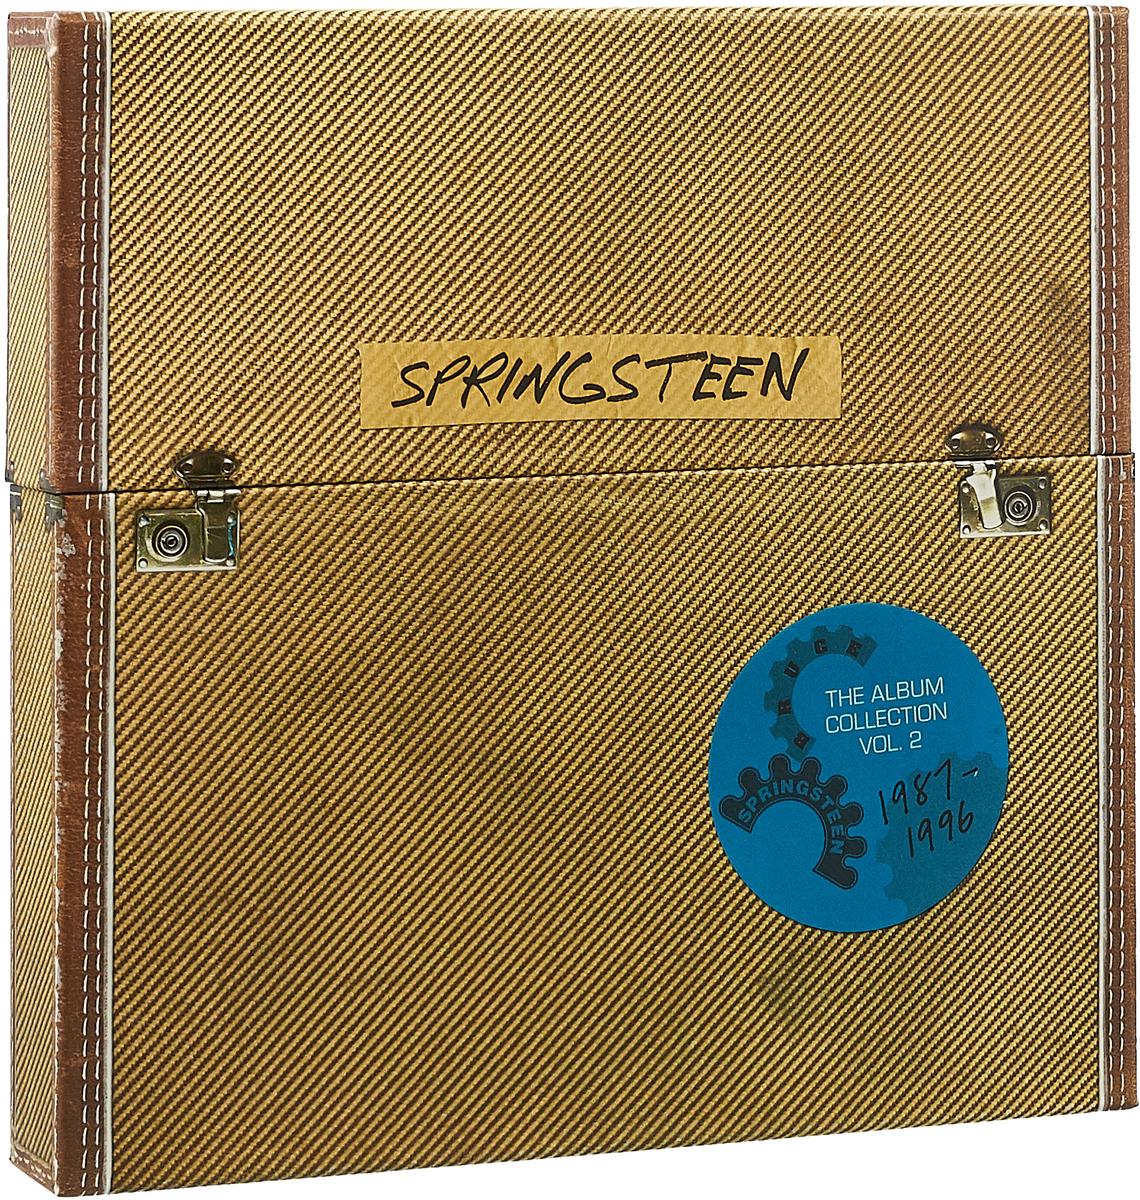 Брюс Спрингстин Bruce Springsteen. Album Collection 2 (10 LP) брюс спрингстин bruce springsteen the human rights broadcast argentina 1988 2 lp